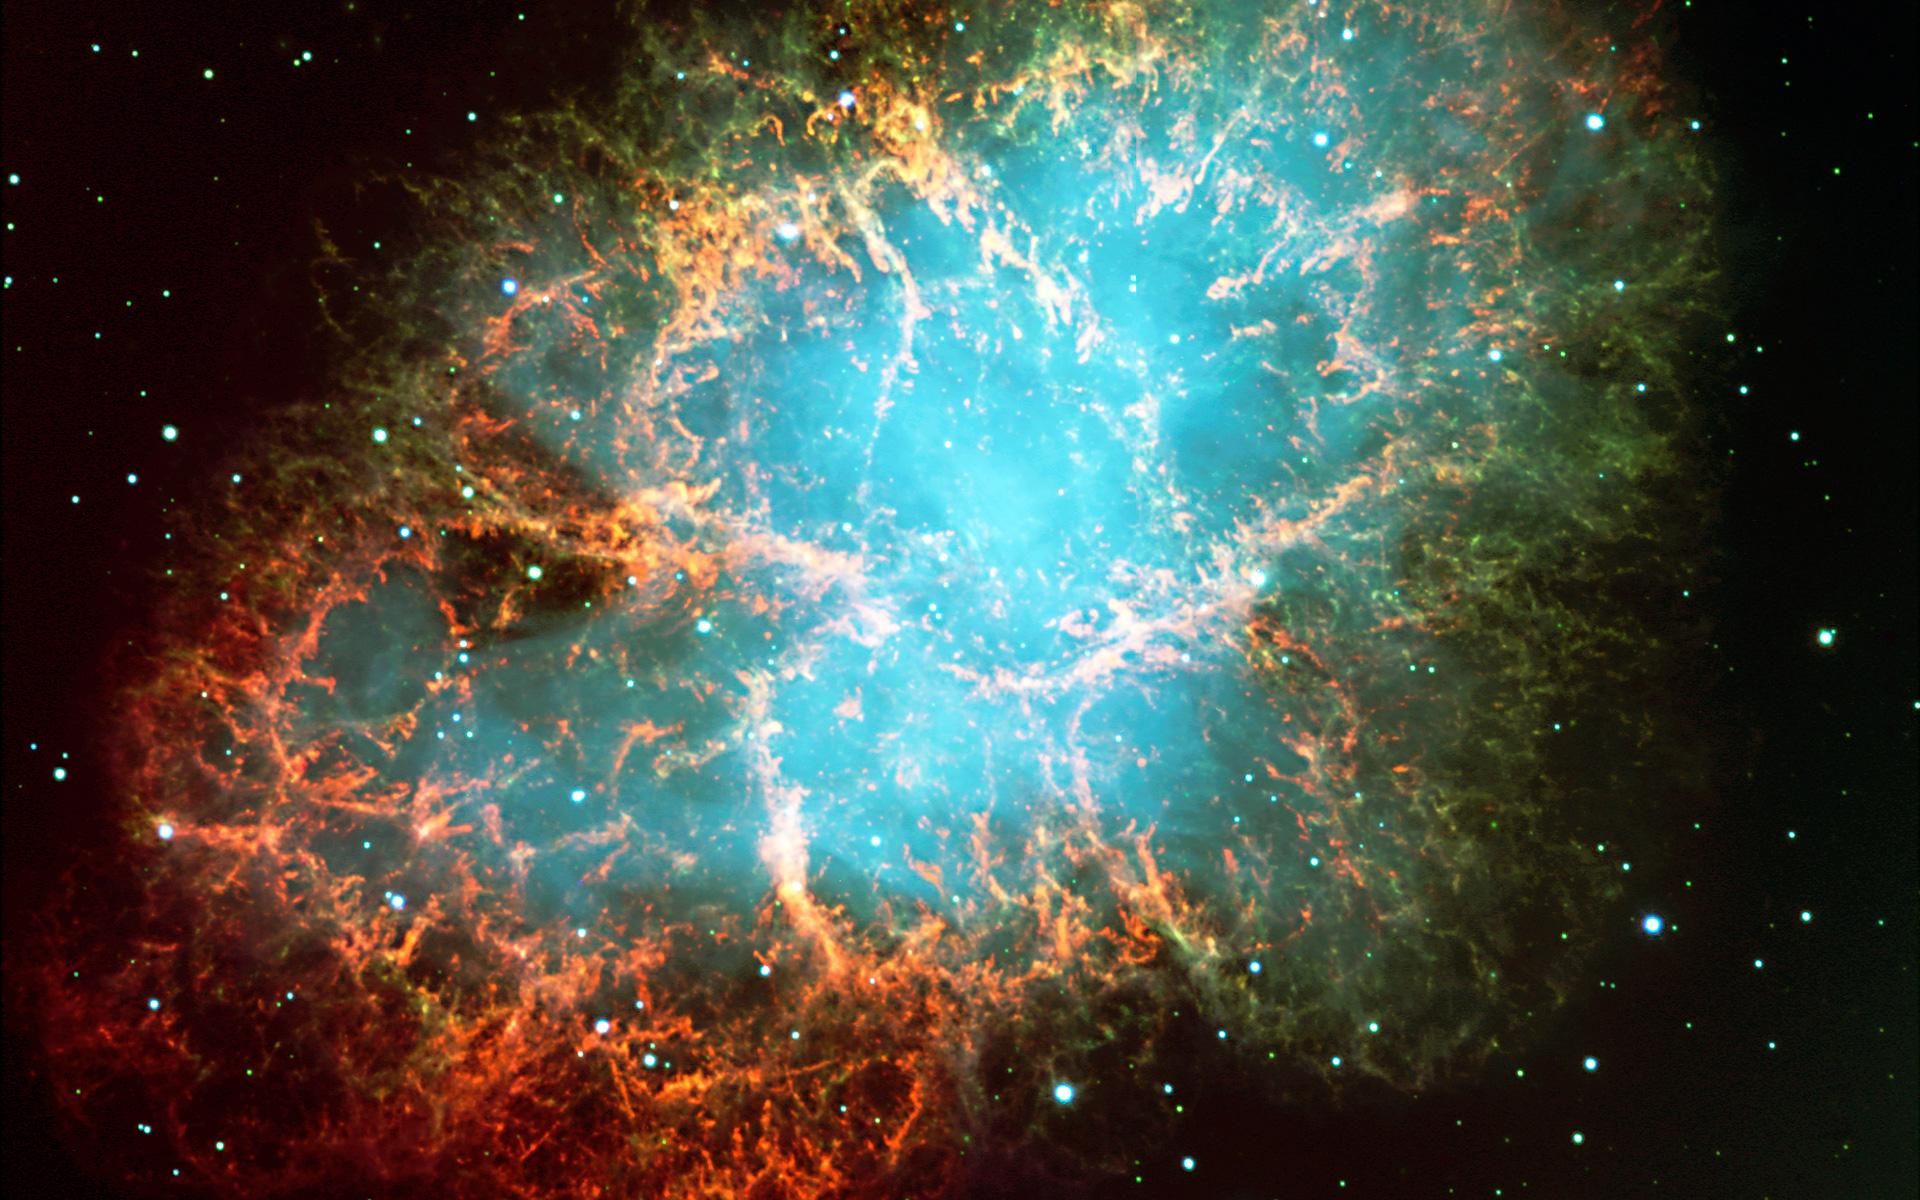 crab nebula to earth distance - photo #33